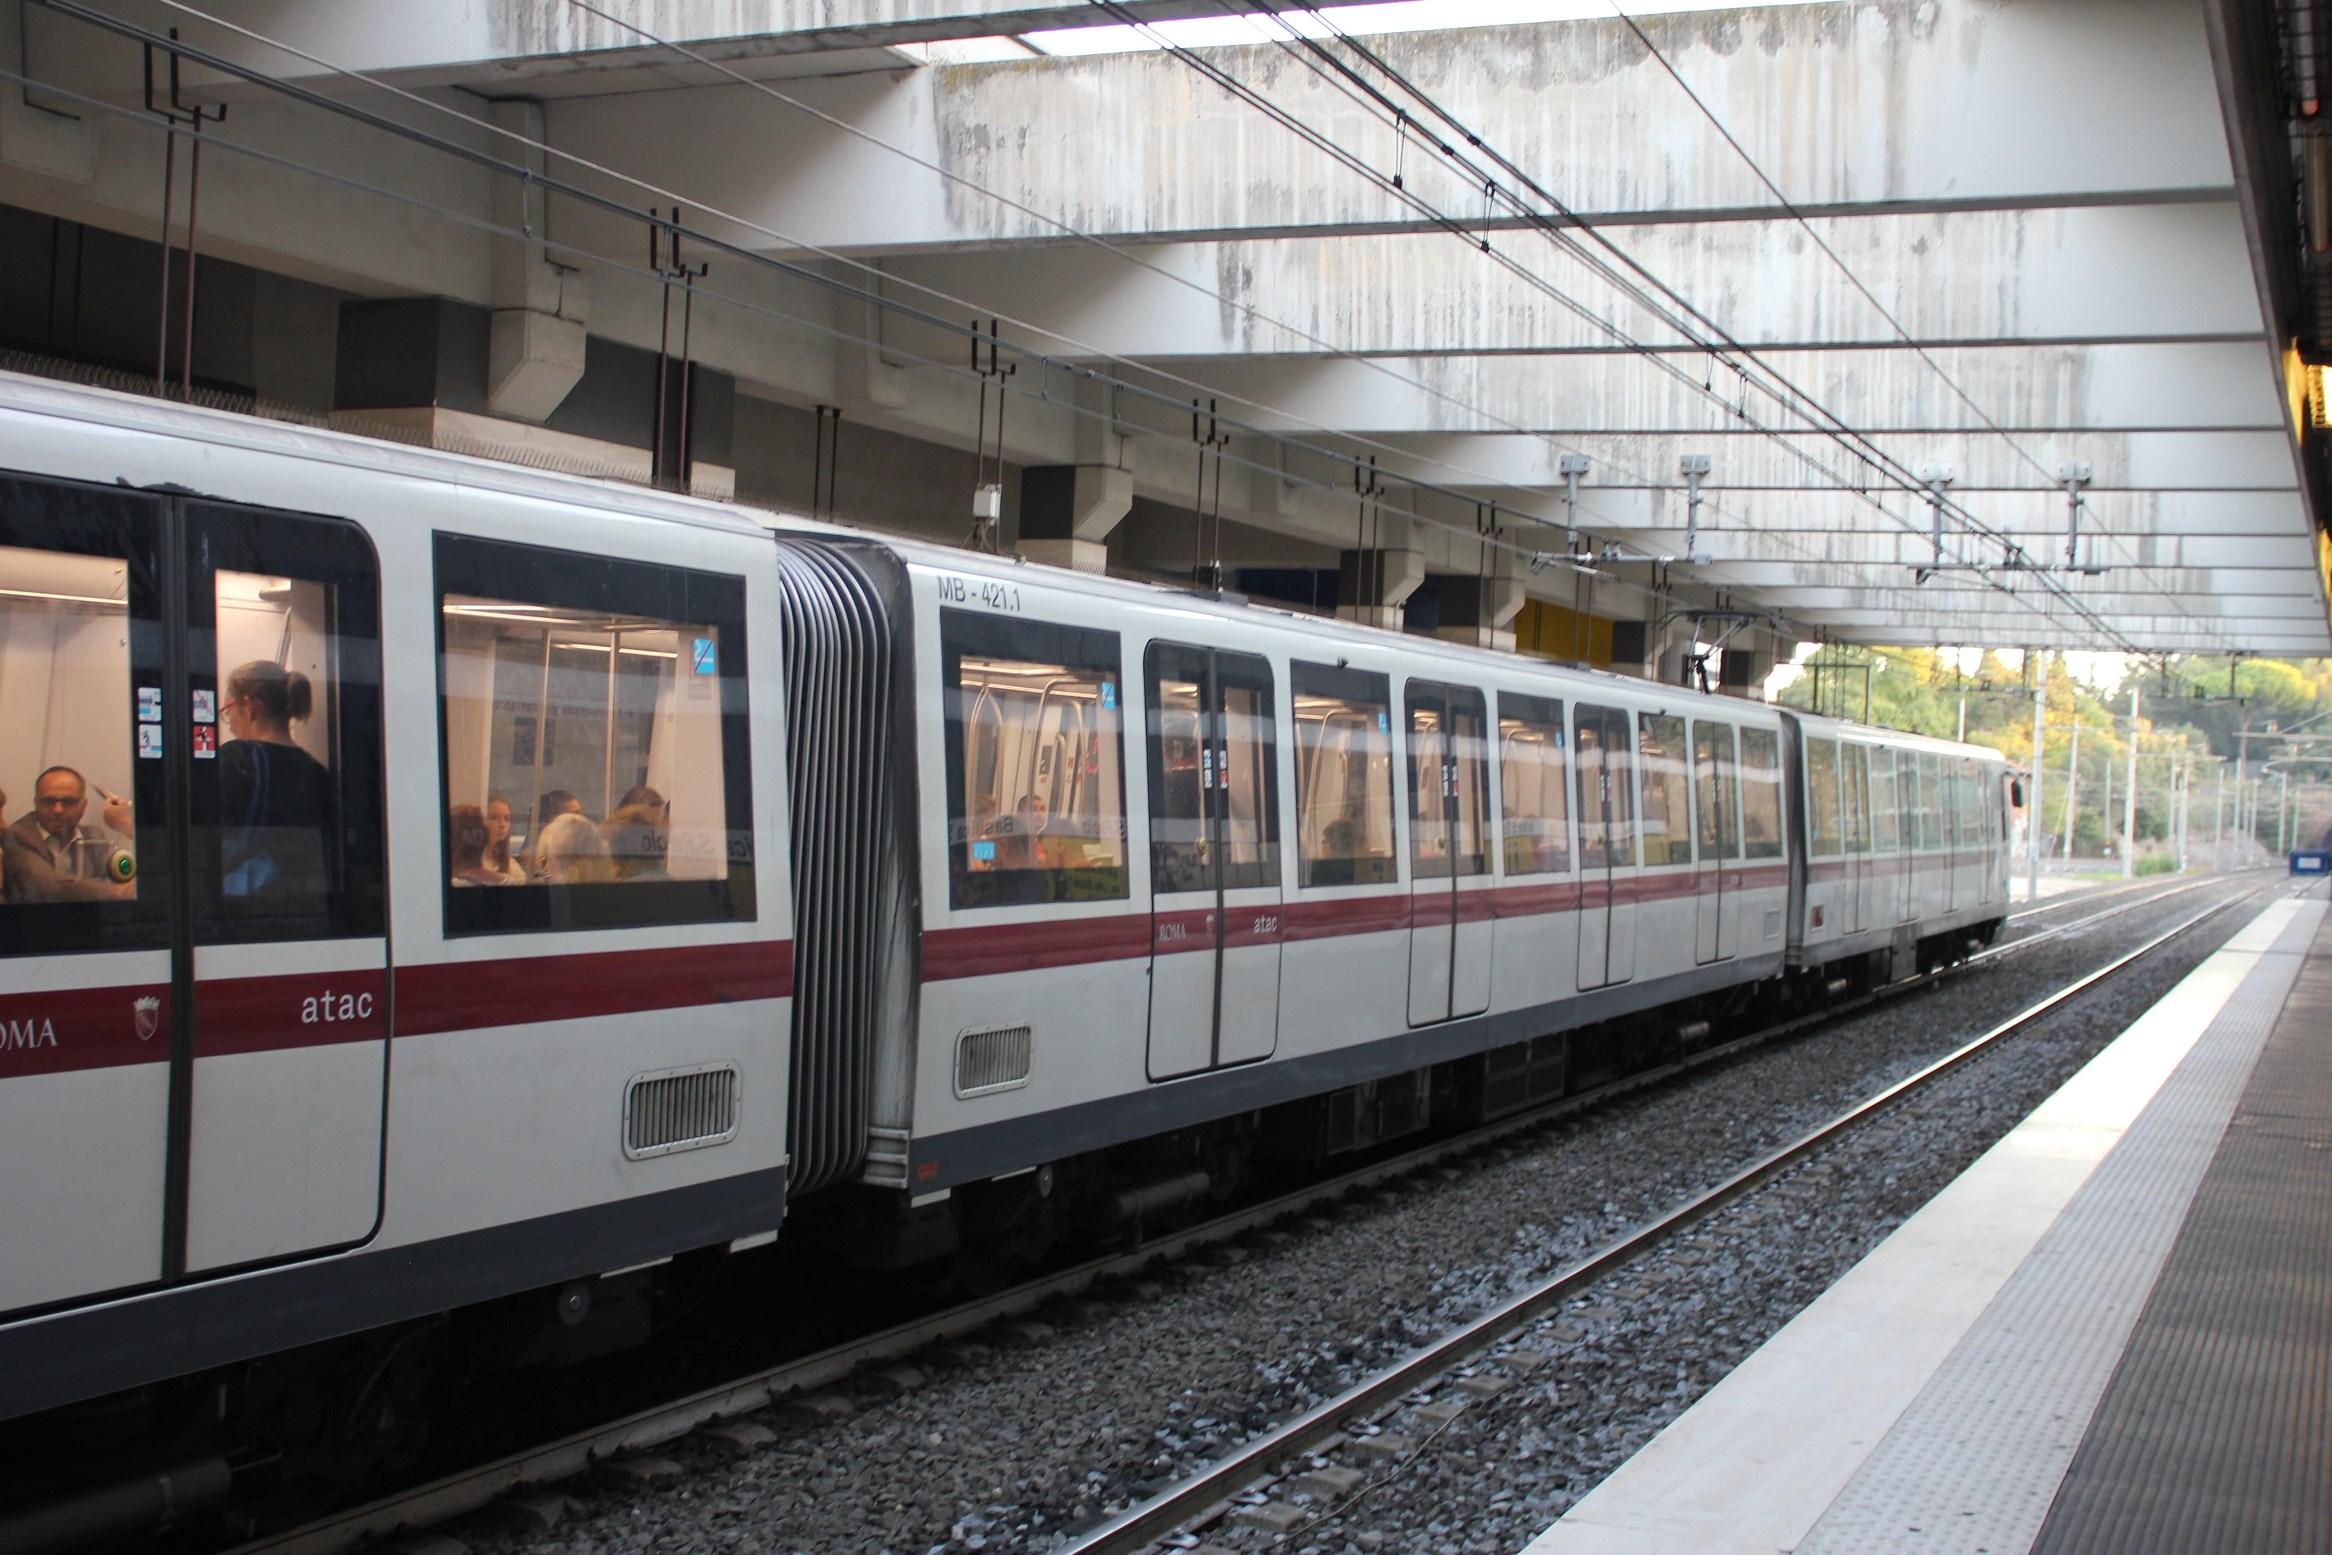 colosseum hours Metro rome